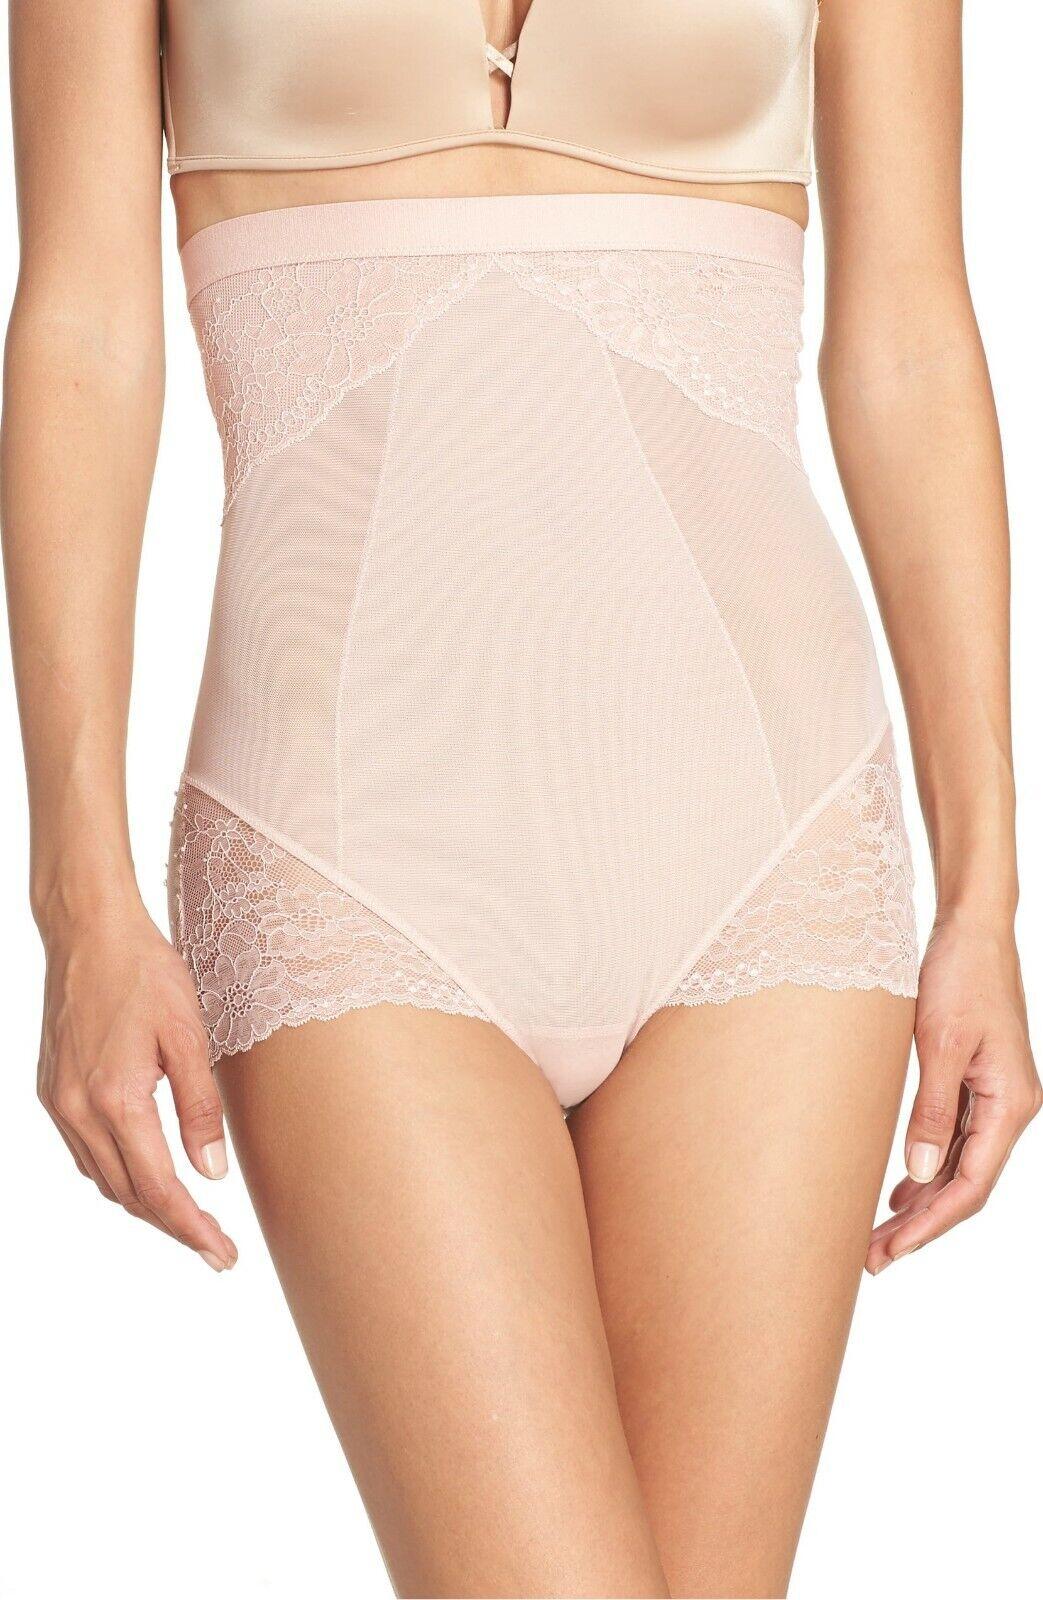 SPANX 10121R Spotlight On Lace High Waist Shaper Briefs pink XS = (0 - 2) FIRMS